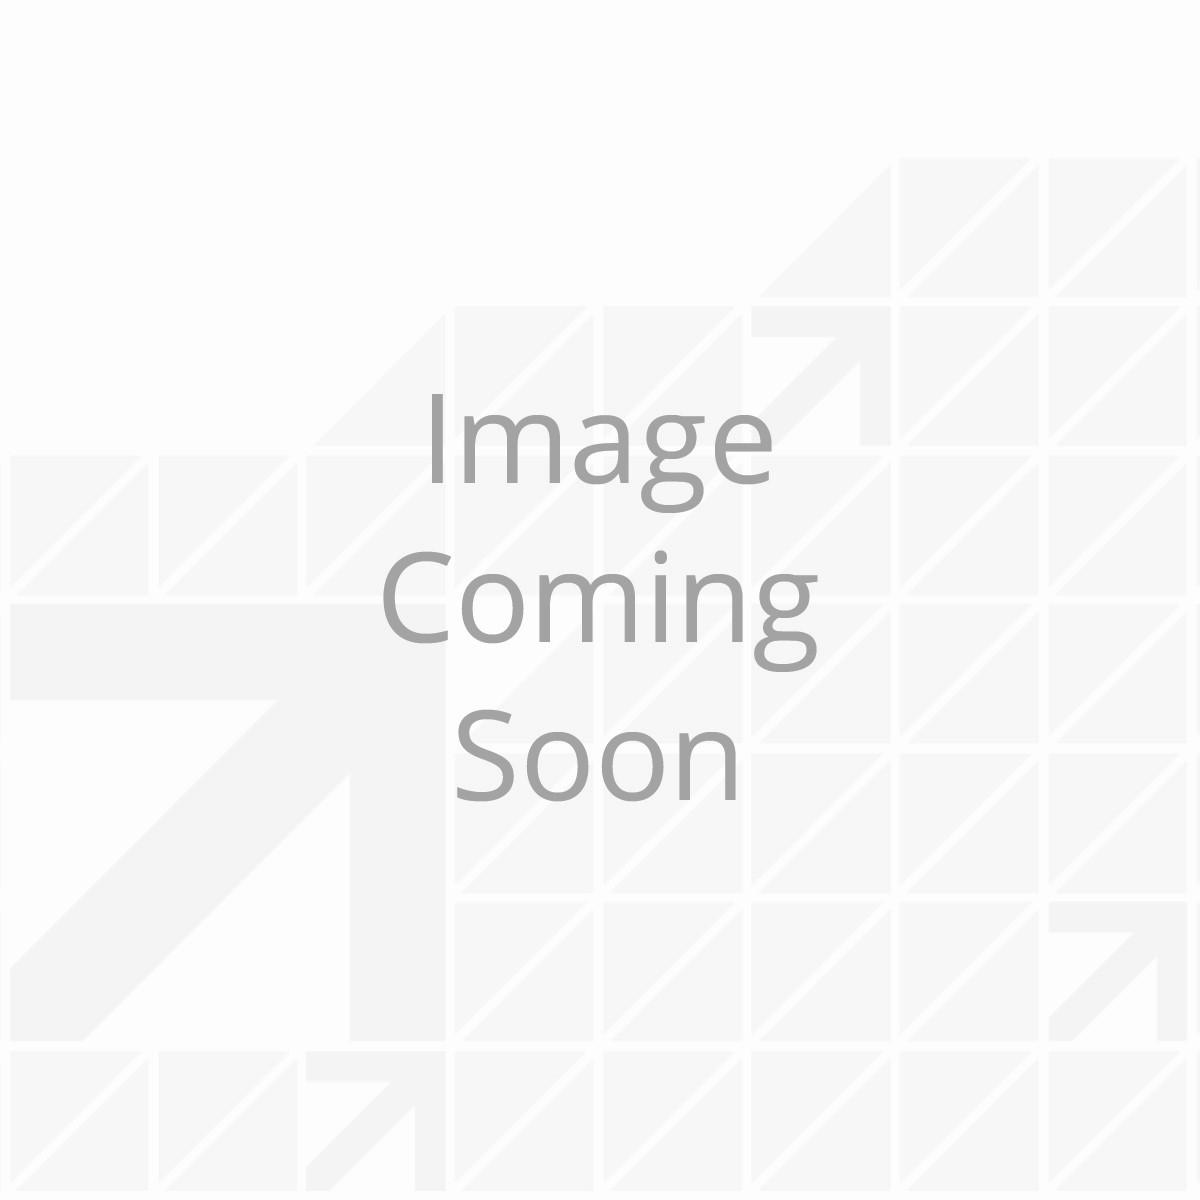 "Long Trunnion Bar Weight Distribution Hitch (8K - 10K lbs., 30-5/8"" Bars)"